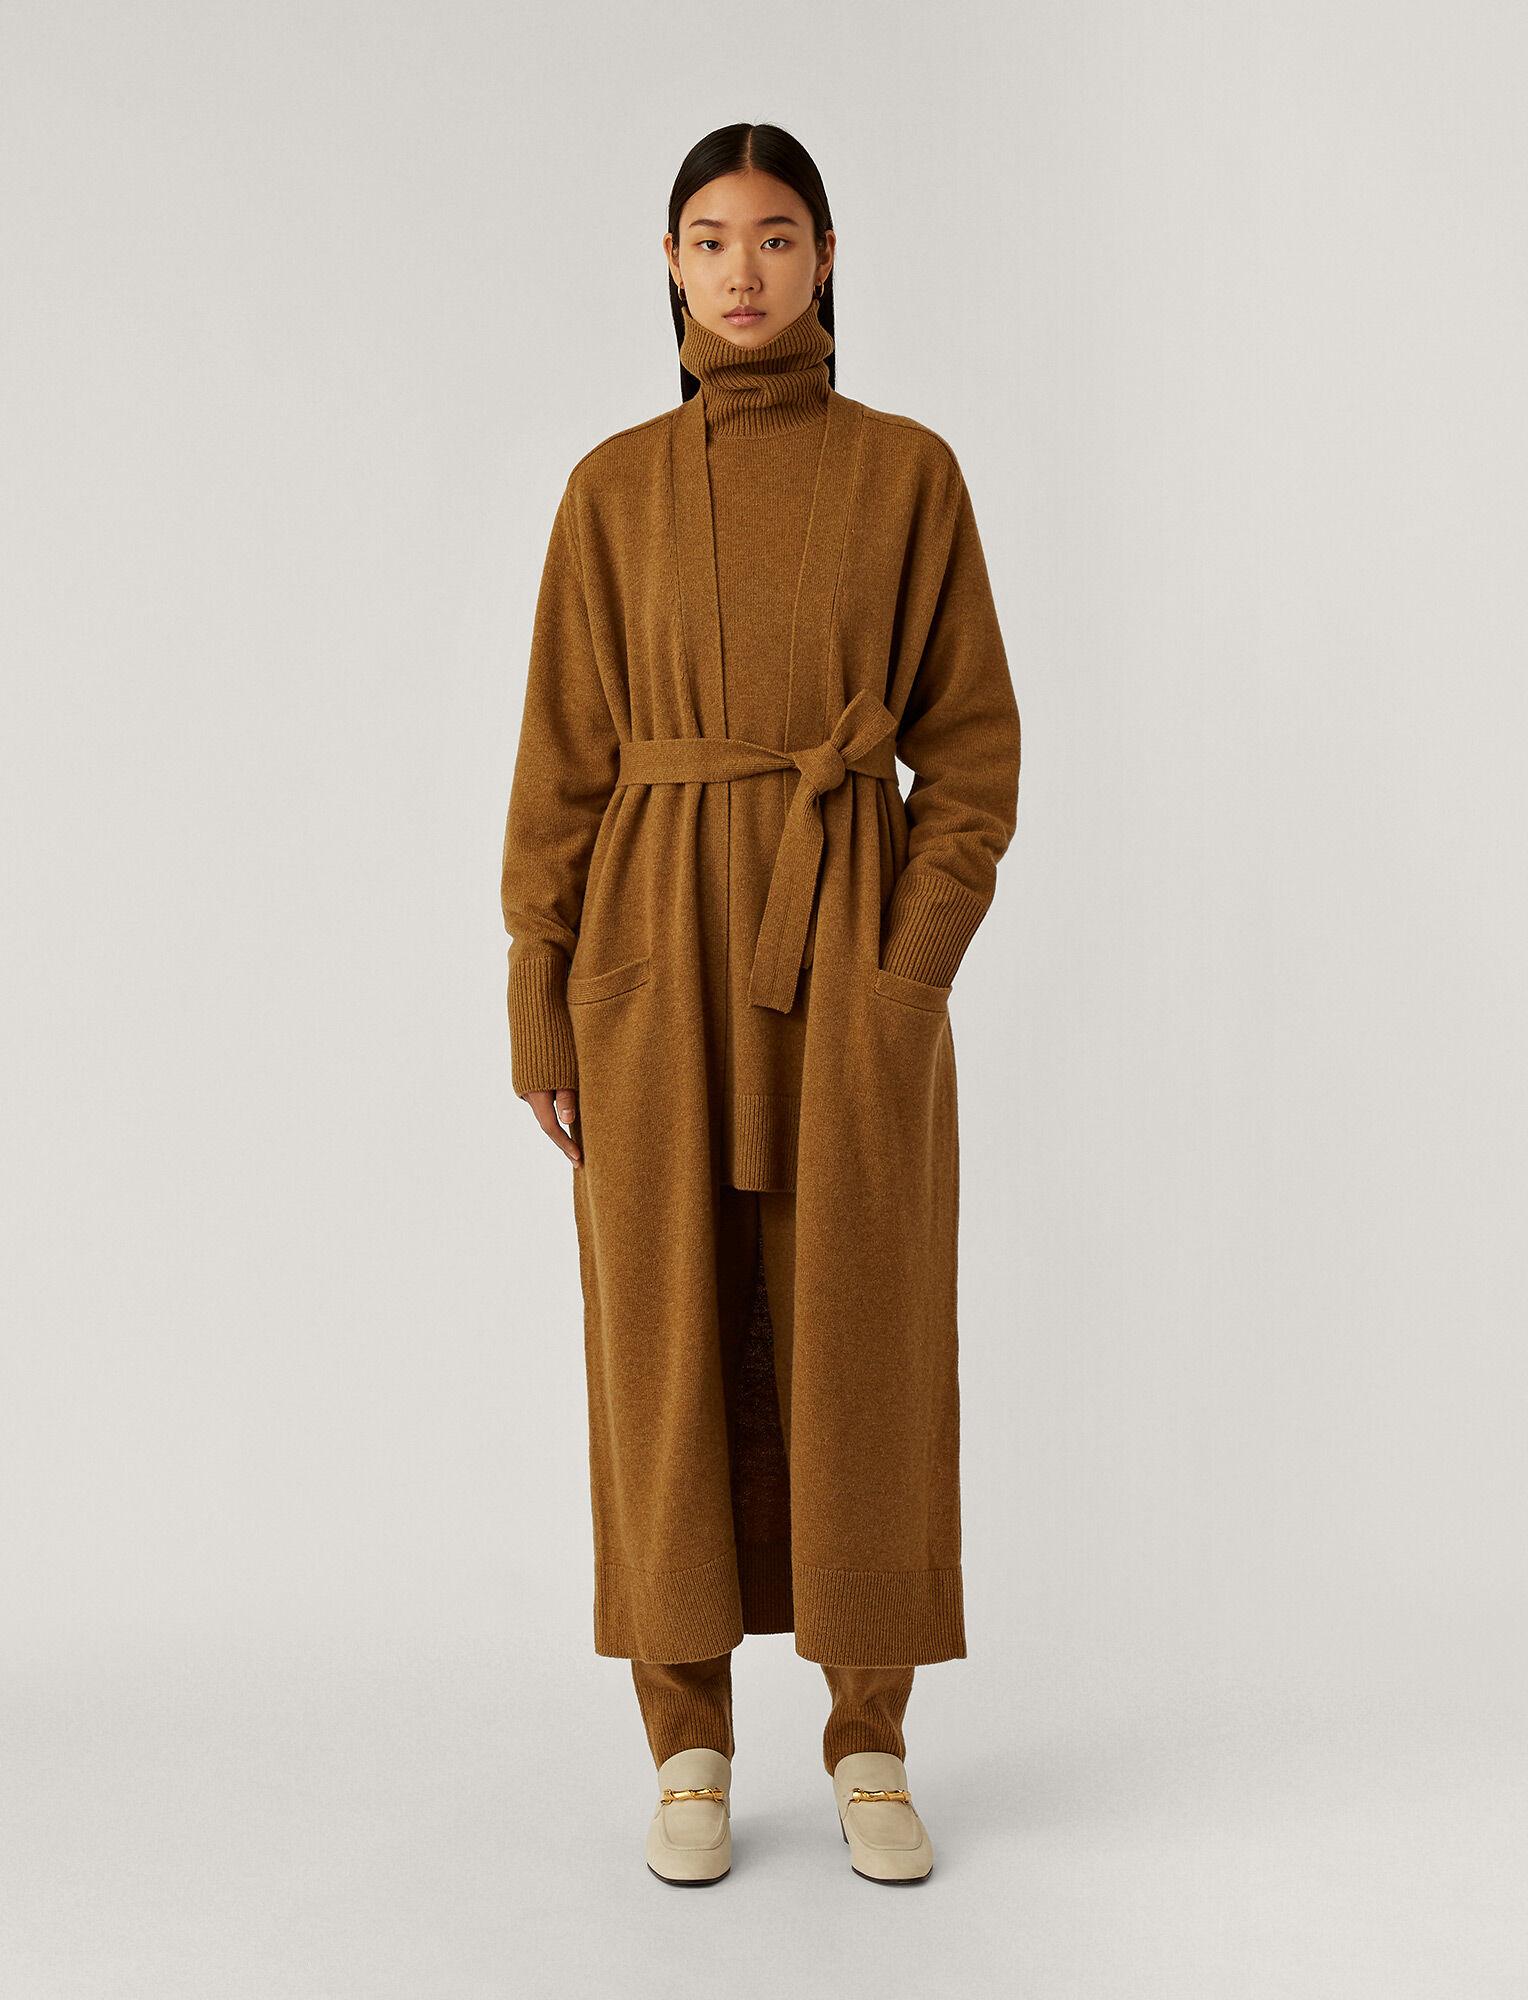 Joseph, Long Cardigan O'Size Knit, in Cumin